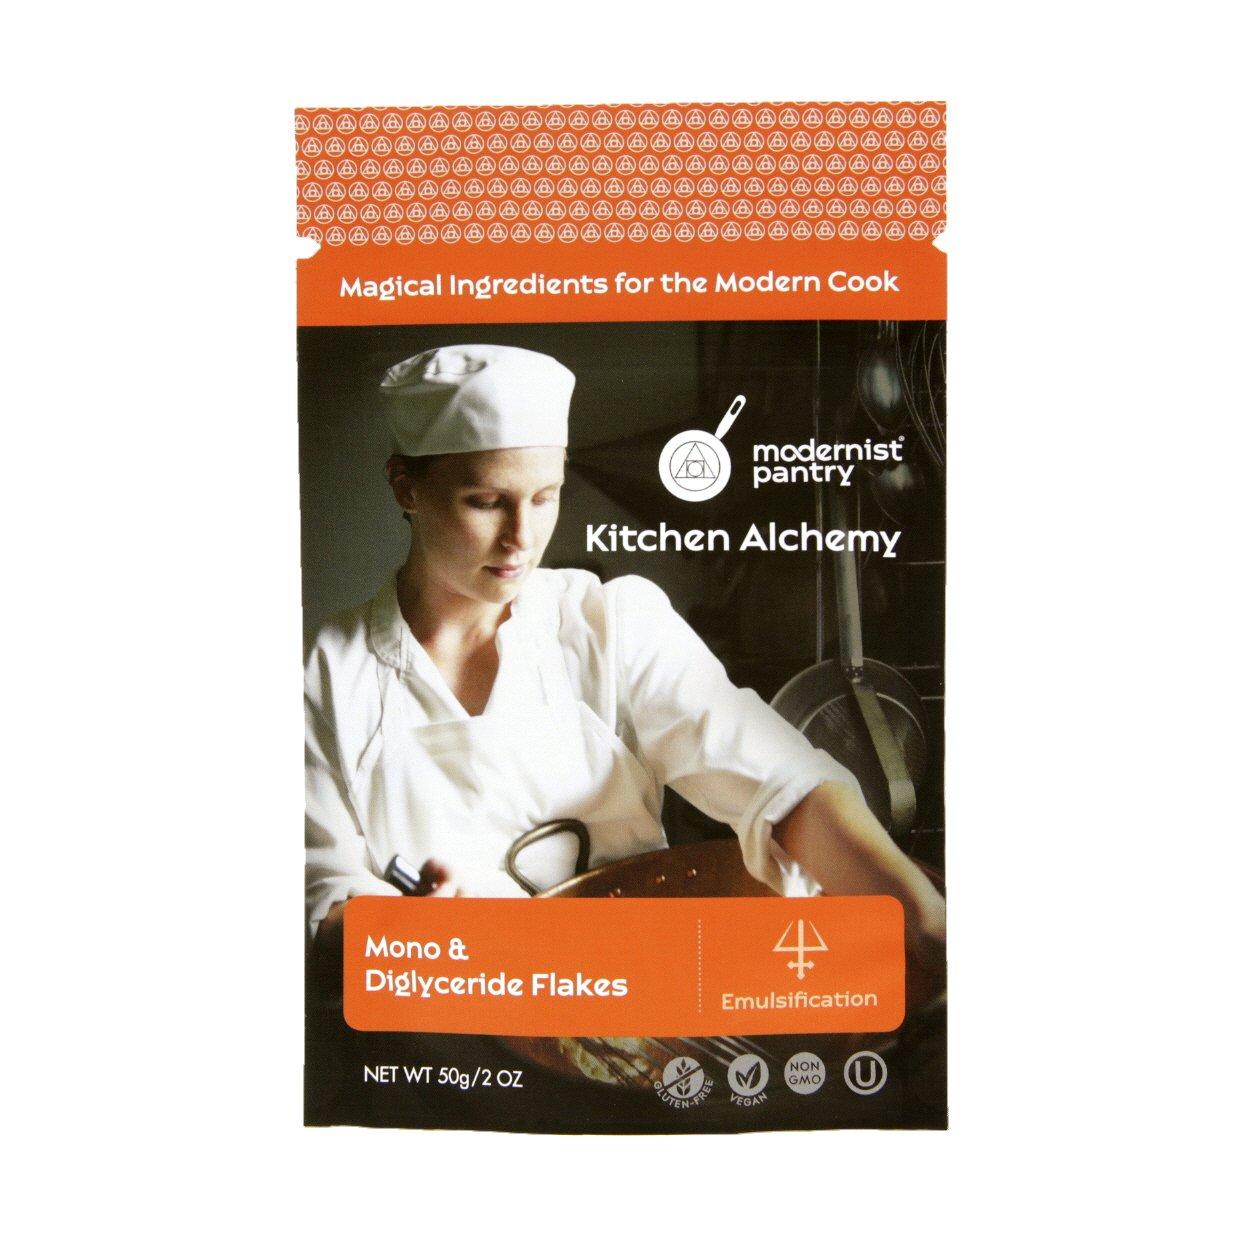 Pure Glycerin Flakes [Mono & Diglyceride] ⊘ Non-GMO ☮ Vegan ✡ OU Kosher Certified - 50g/2oz